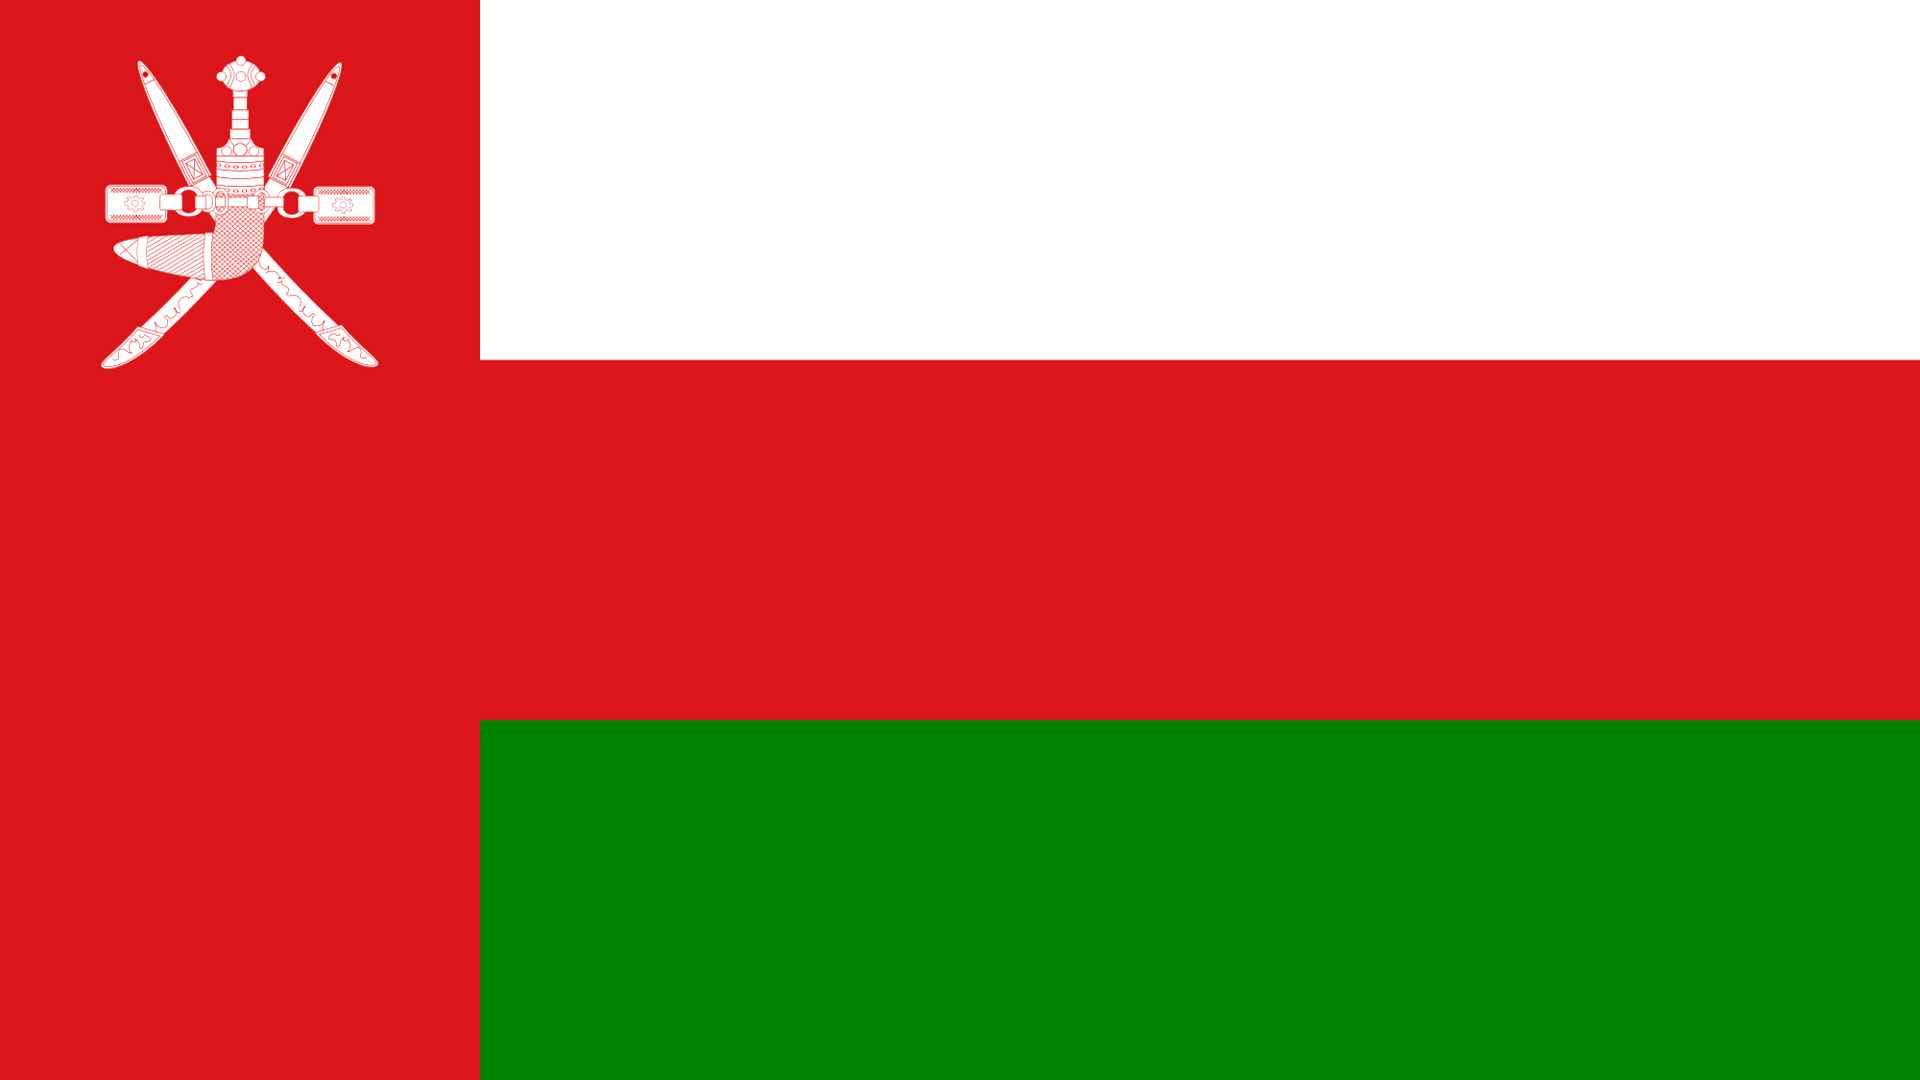 Cute Doll Hd Wallpaper For Desktop Oman Flag Wallpaper High Definition High Quality